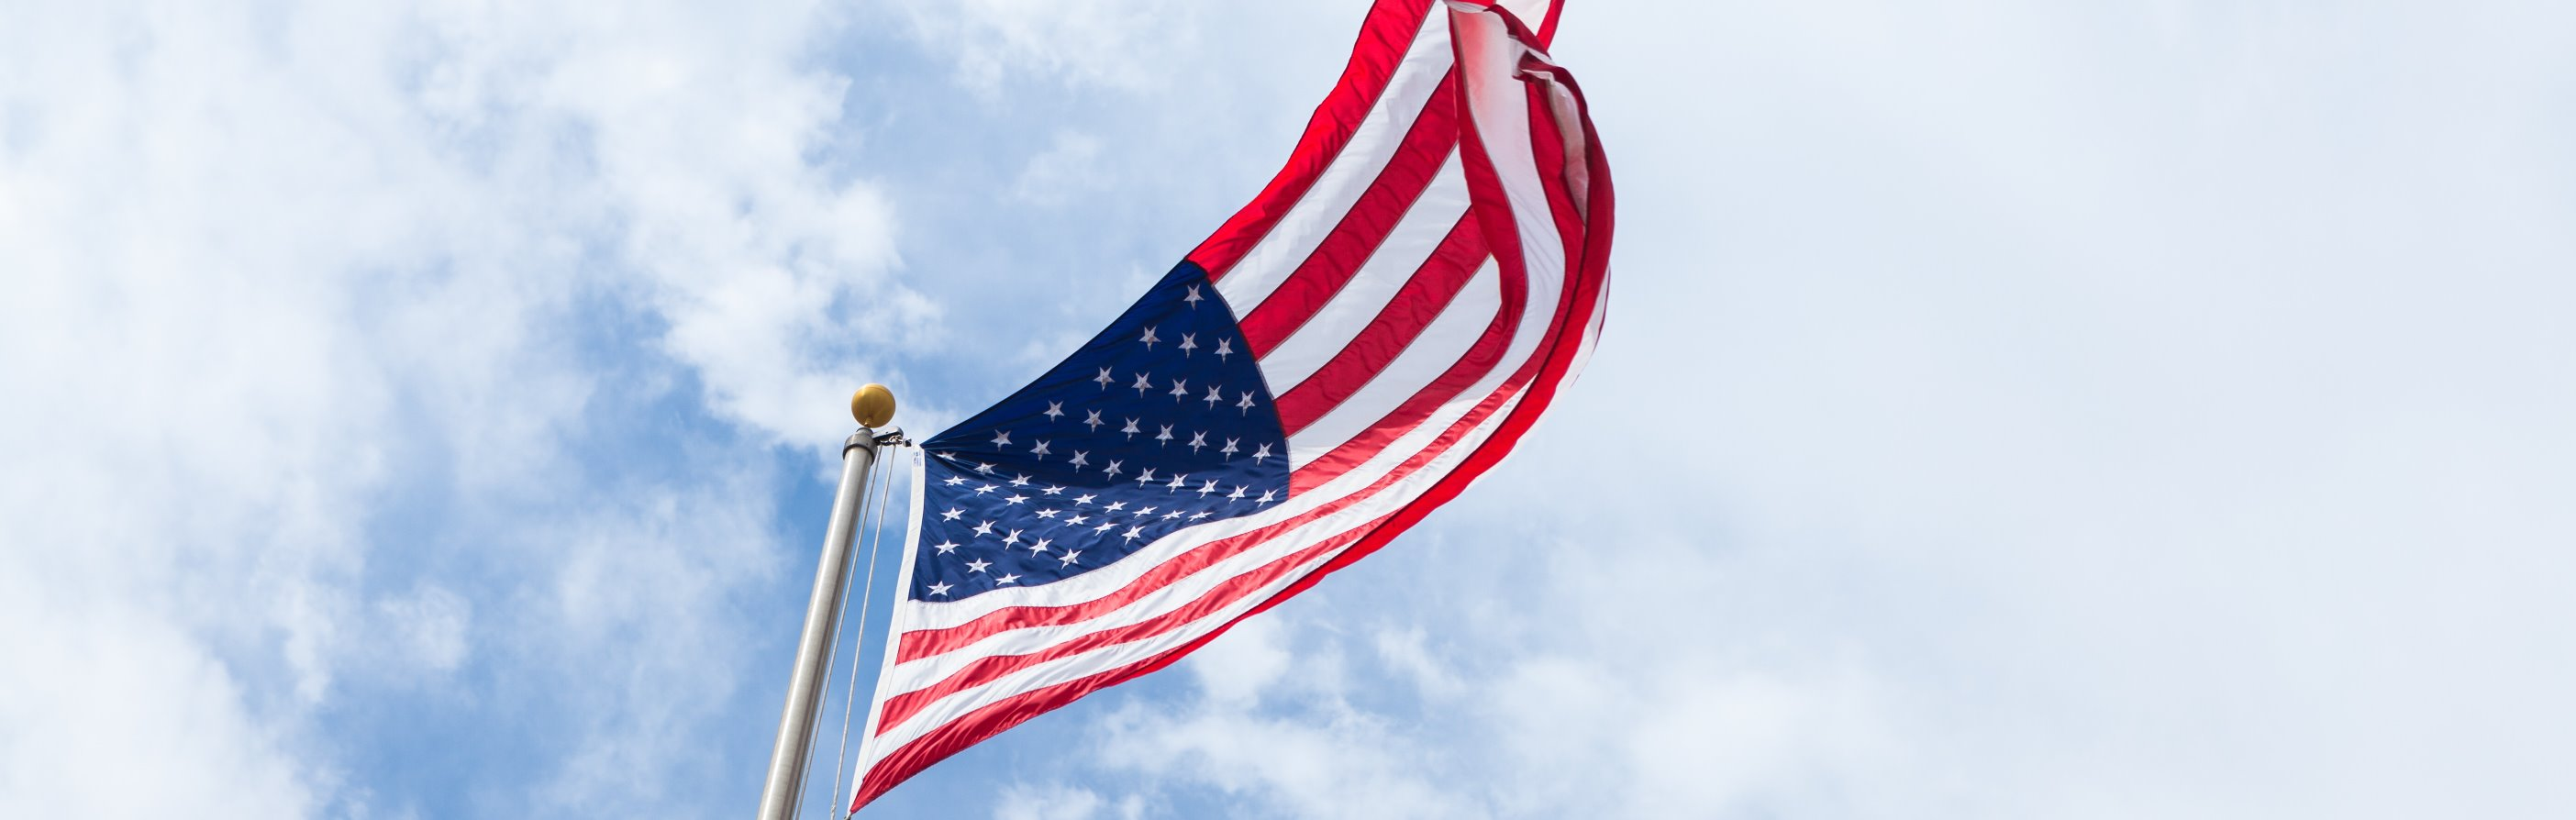 US flag against sky